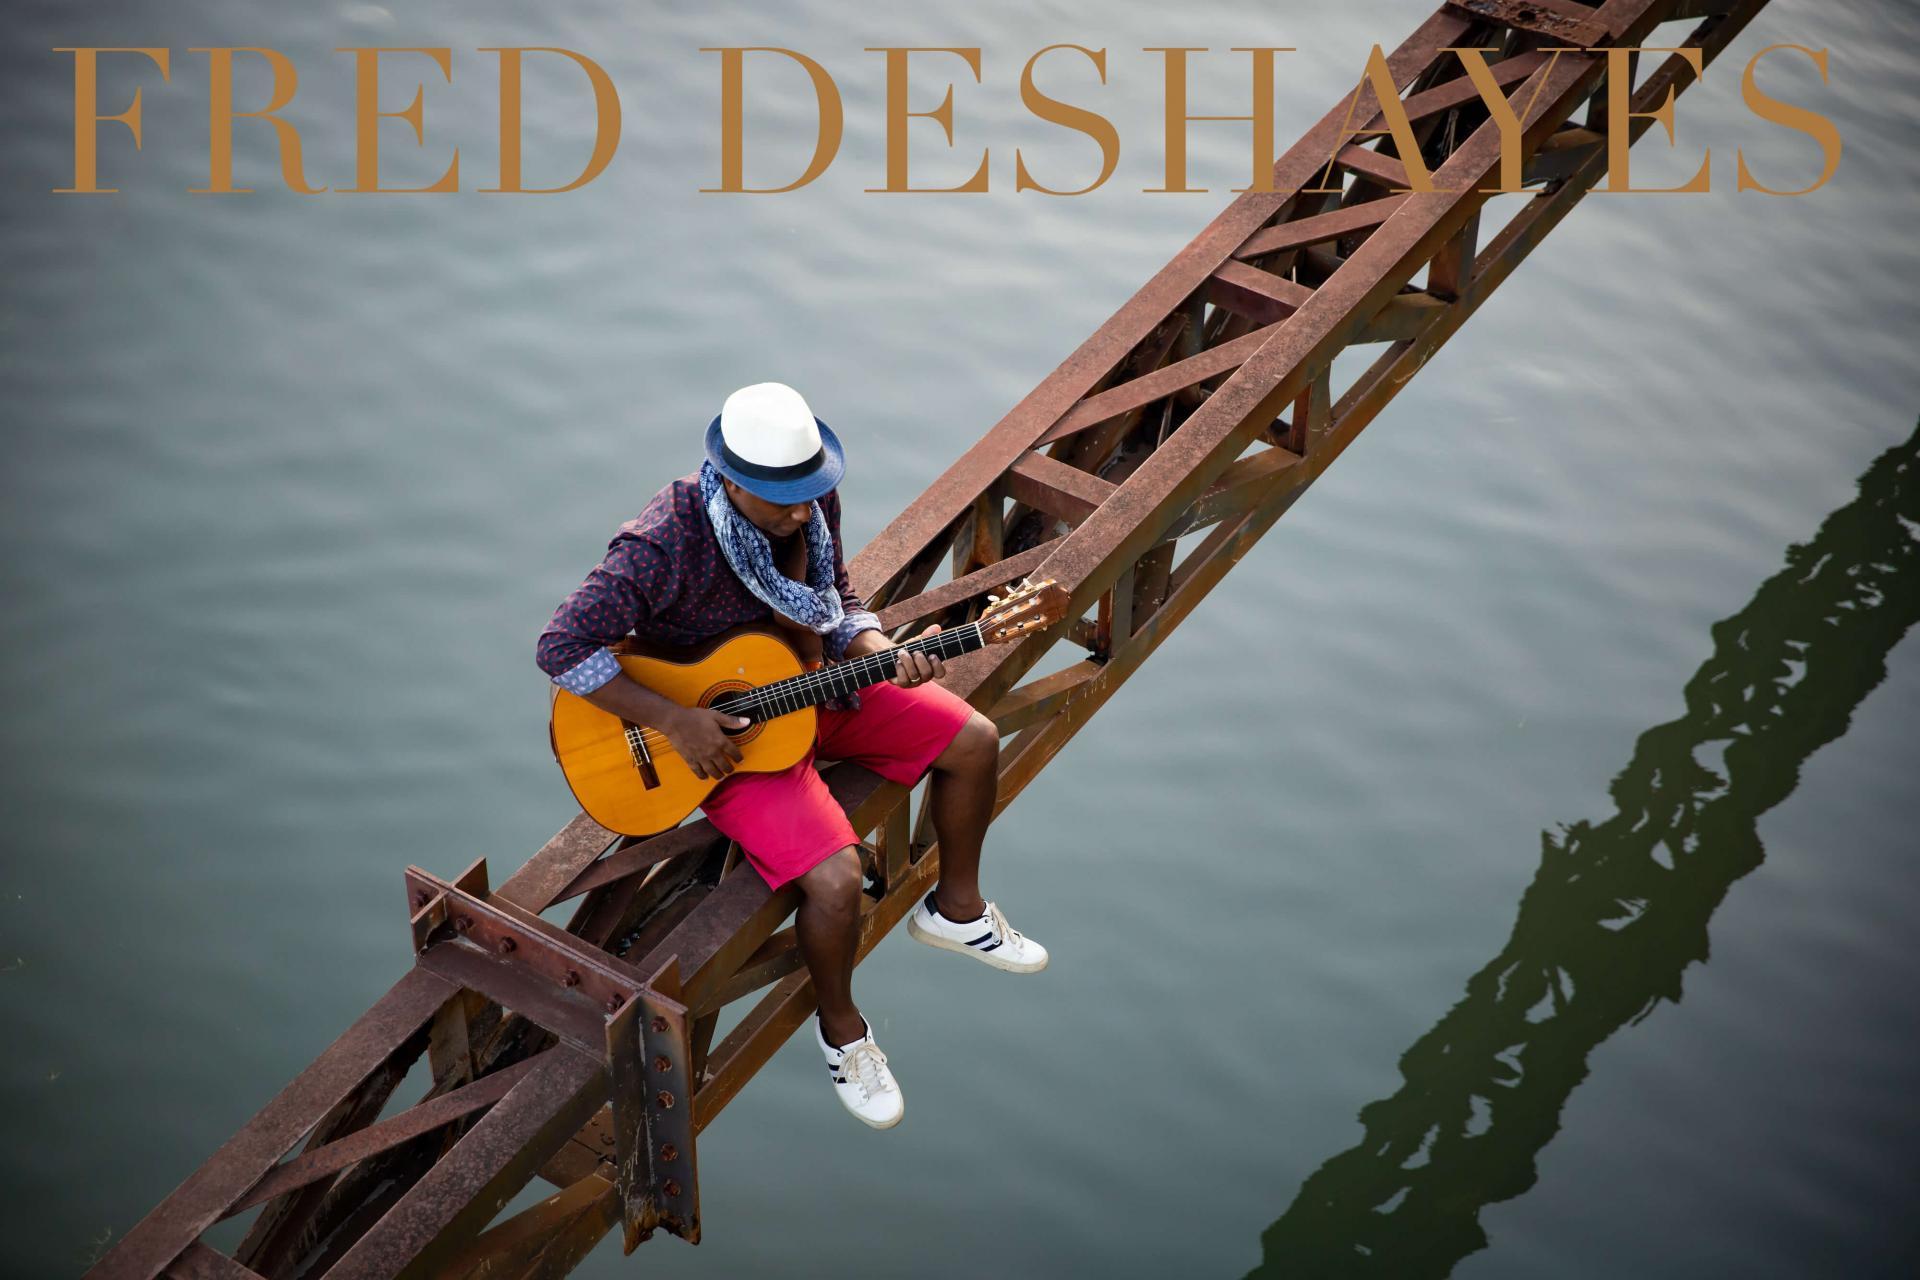 Fred Deshayes